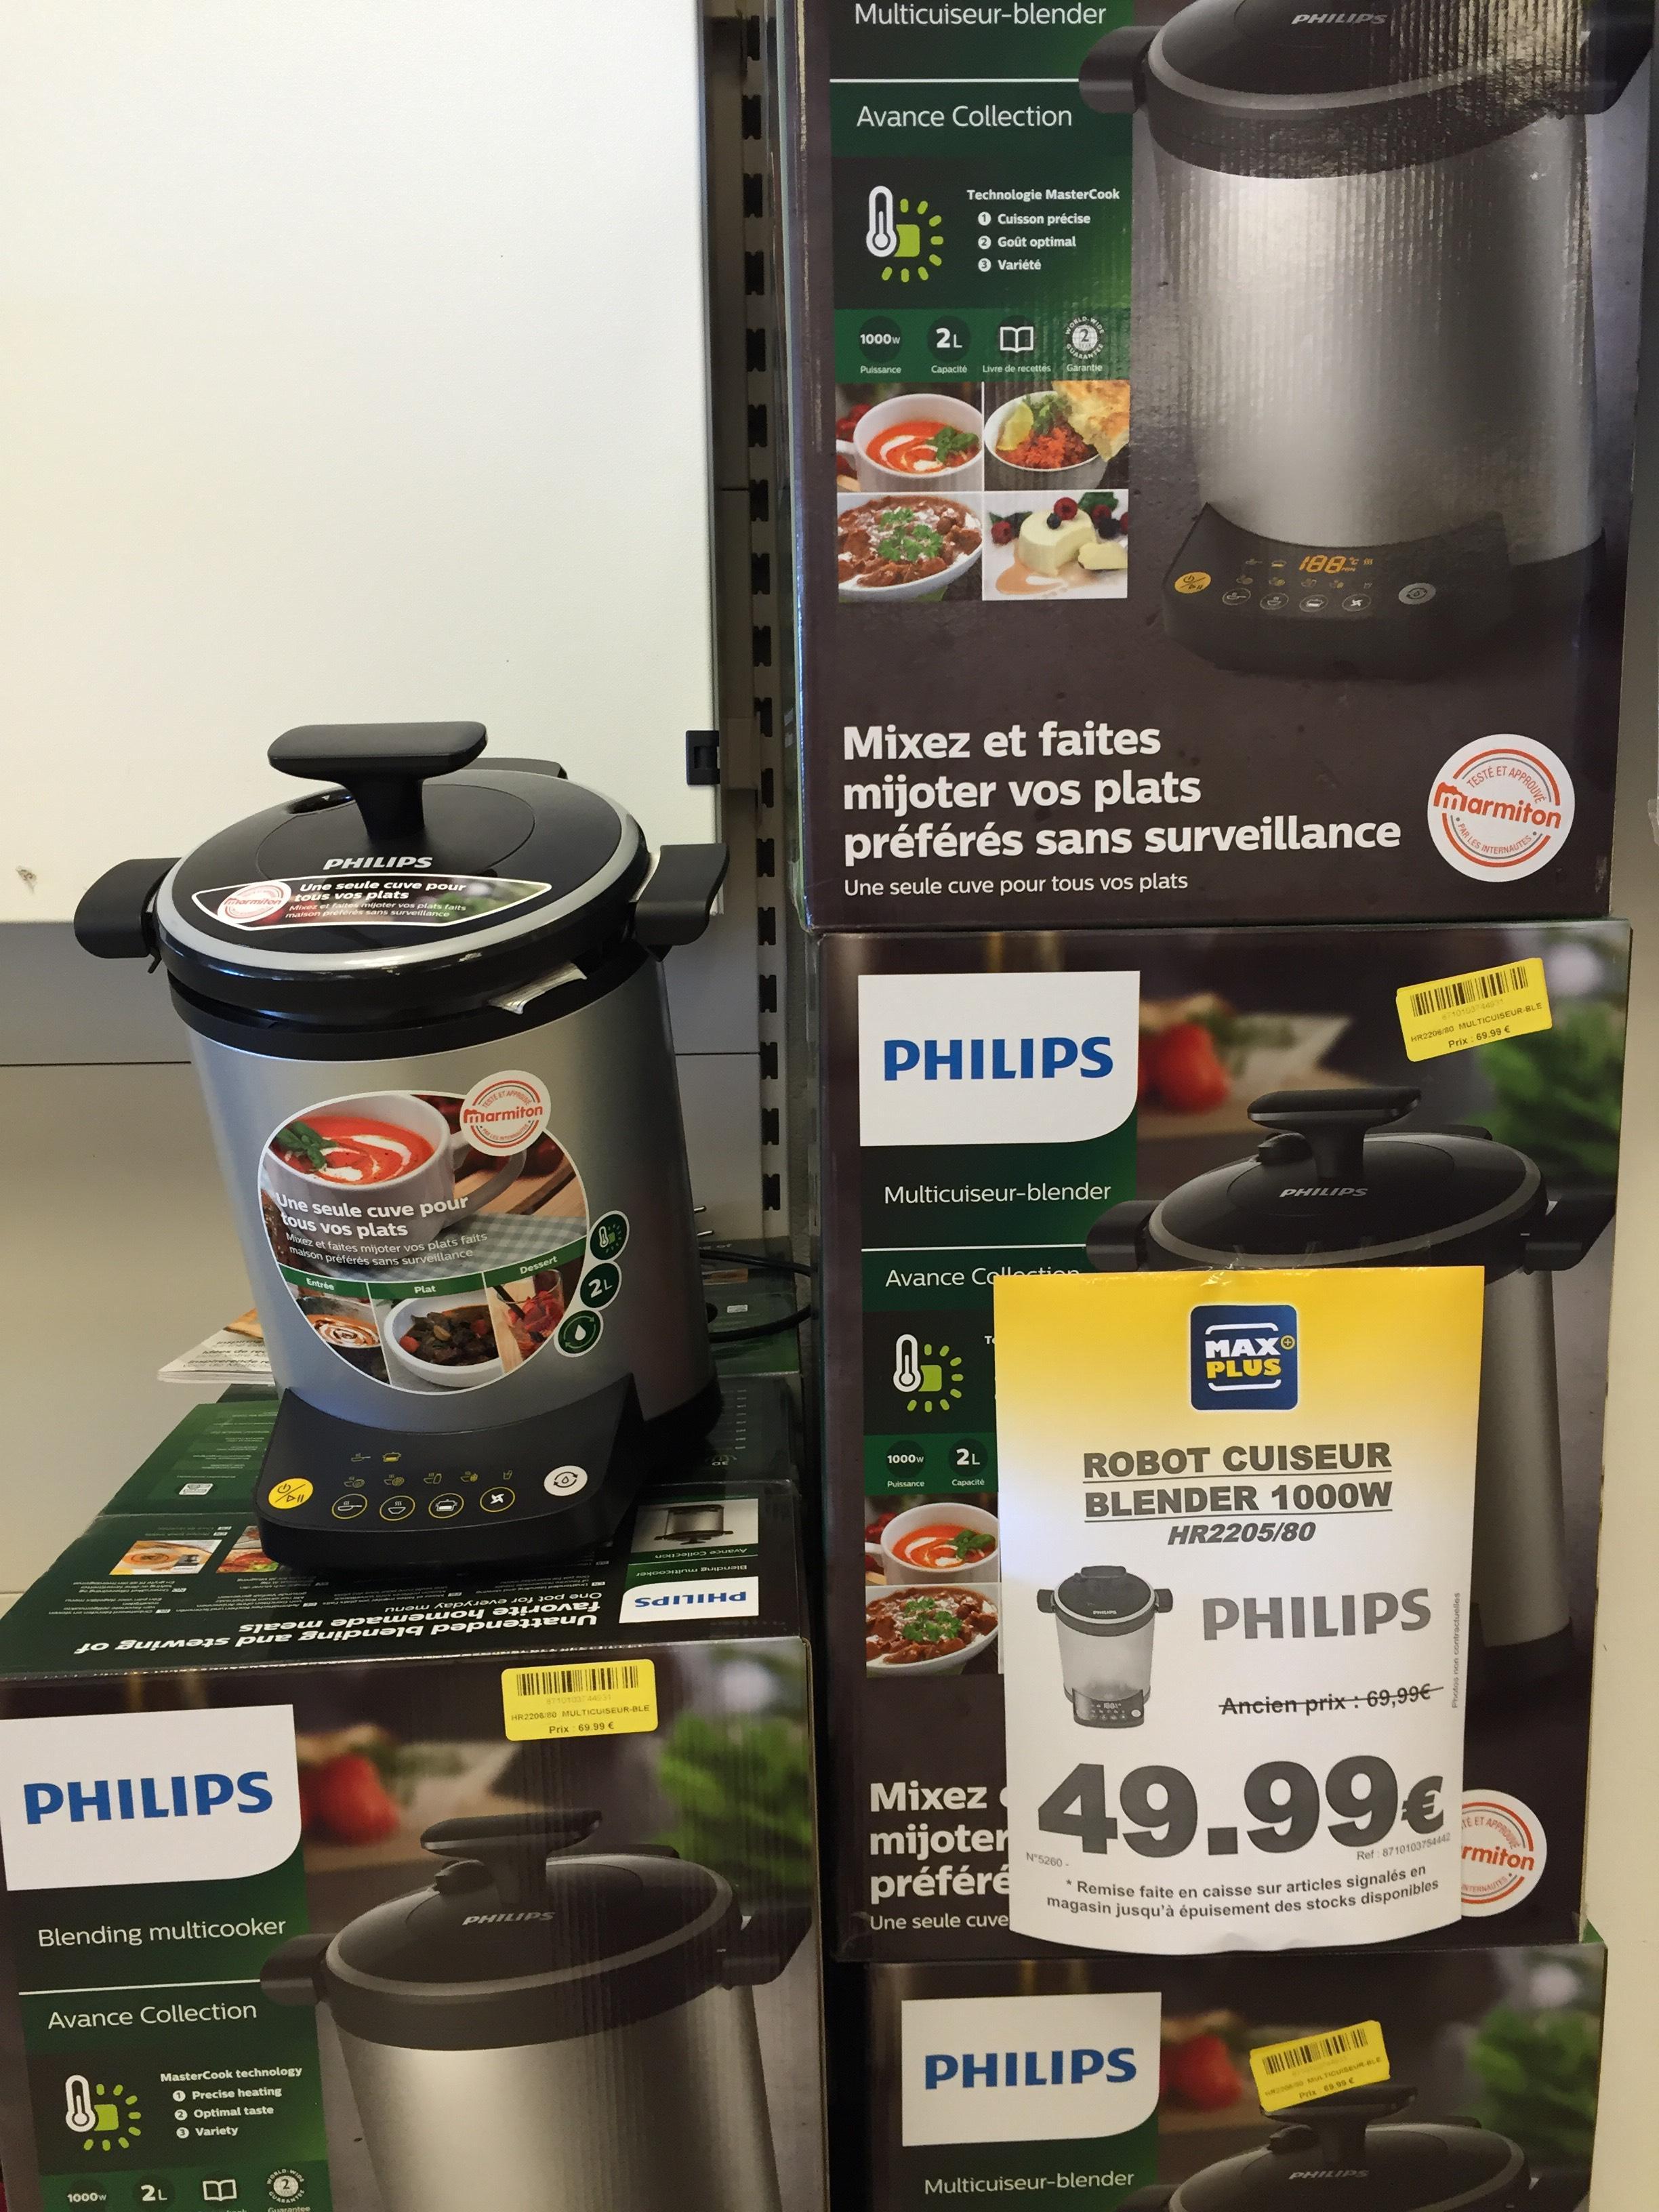 Multicuiseur blender Philips HR2206-90